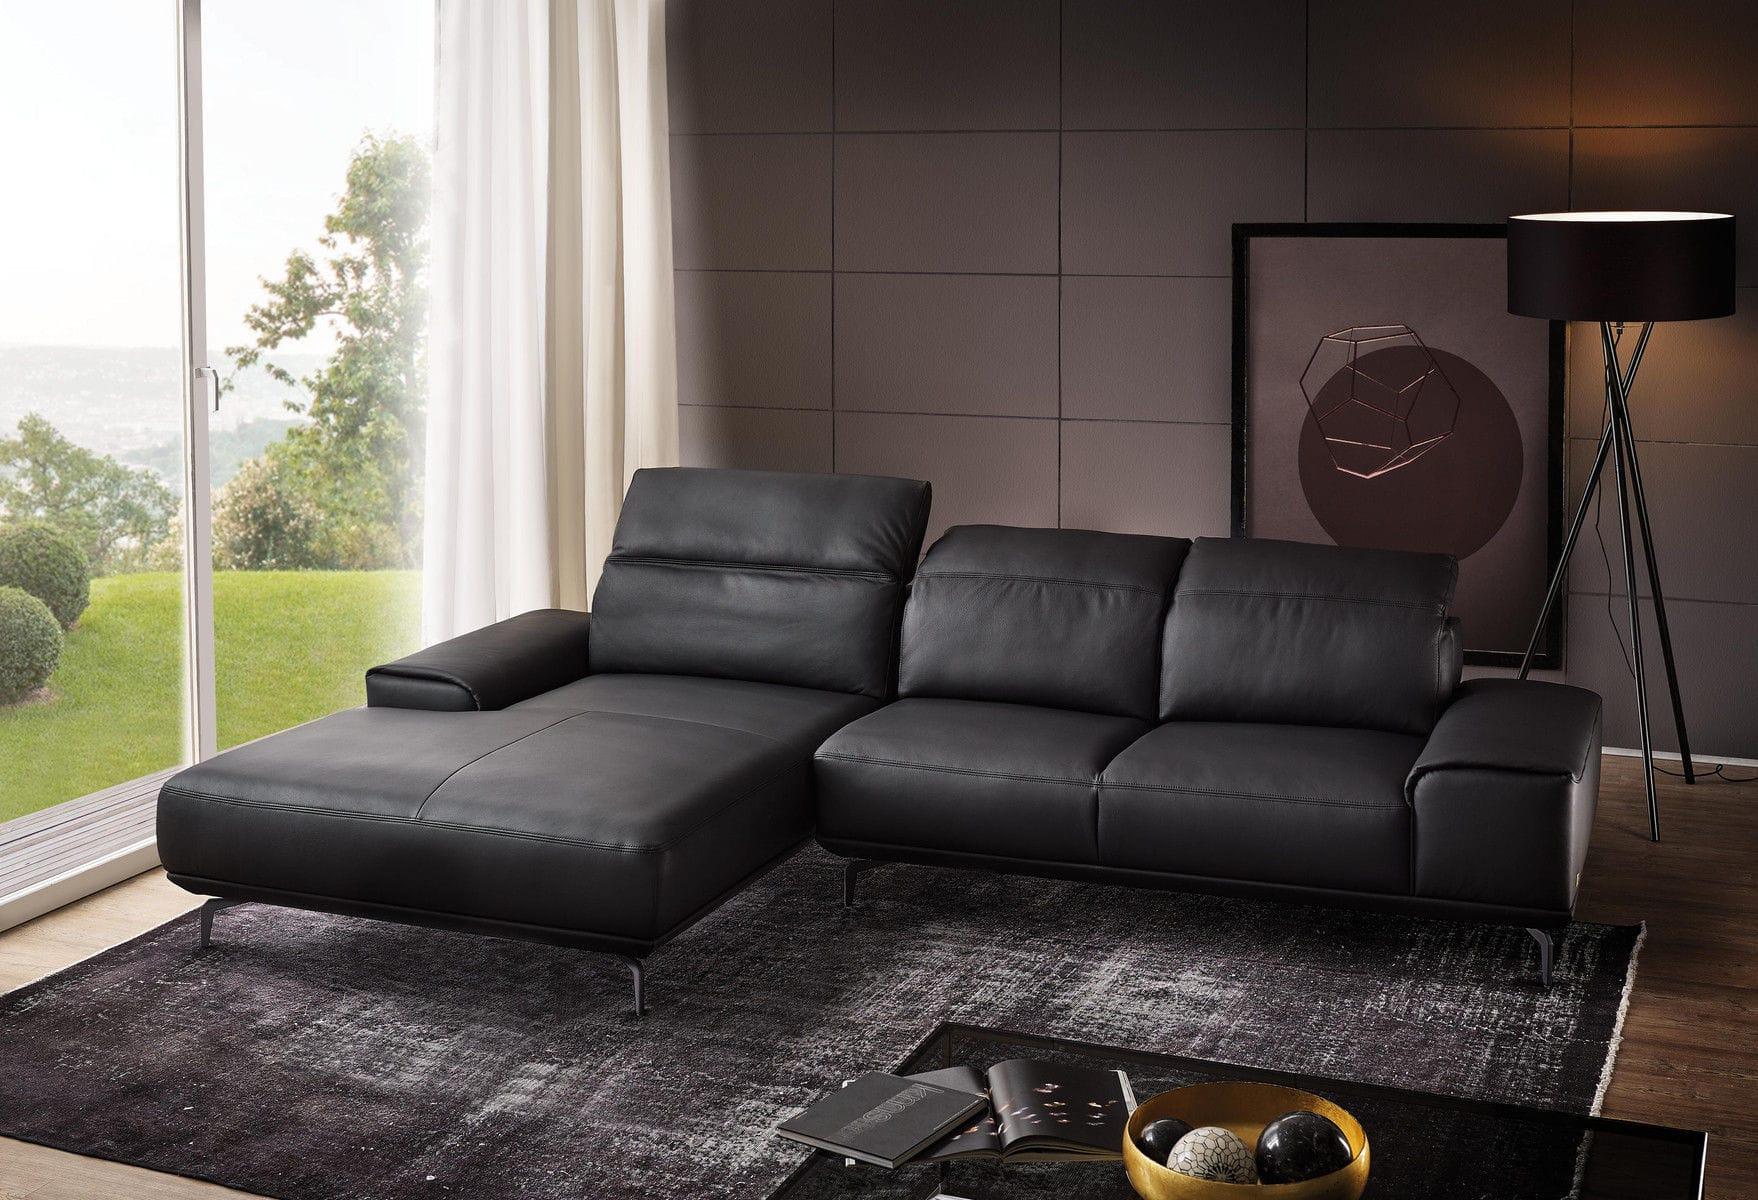 Modulierbares Sofa Modern Stoff Leder Mr 2490 Musterring